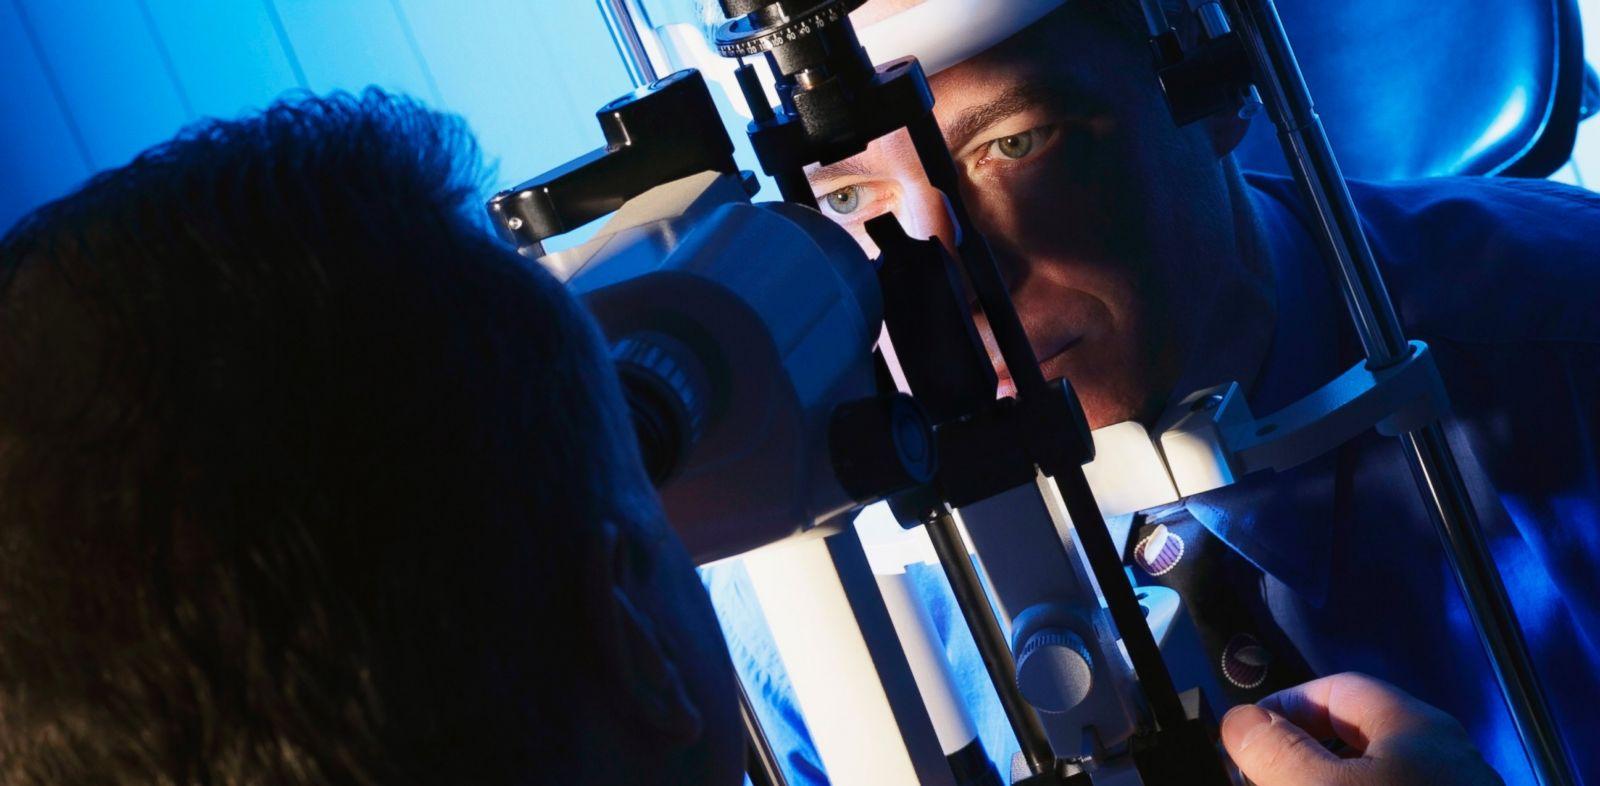 PHOTO: Your eyes vessels can help identify hidden health dangers.